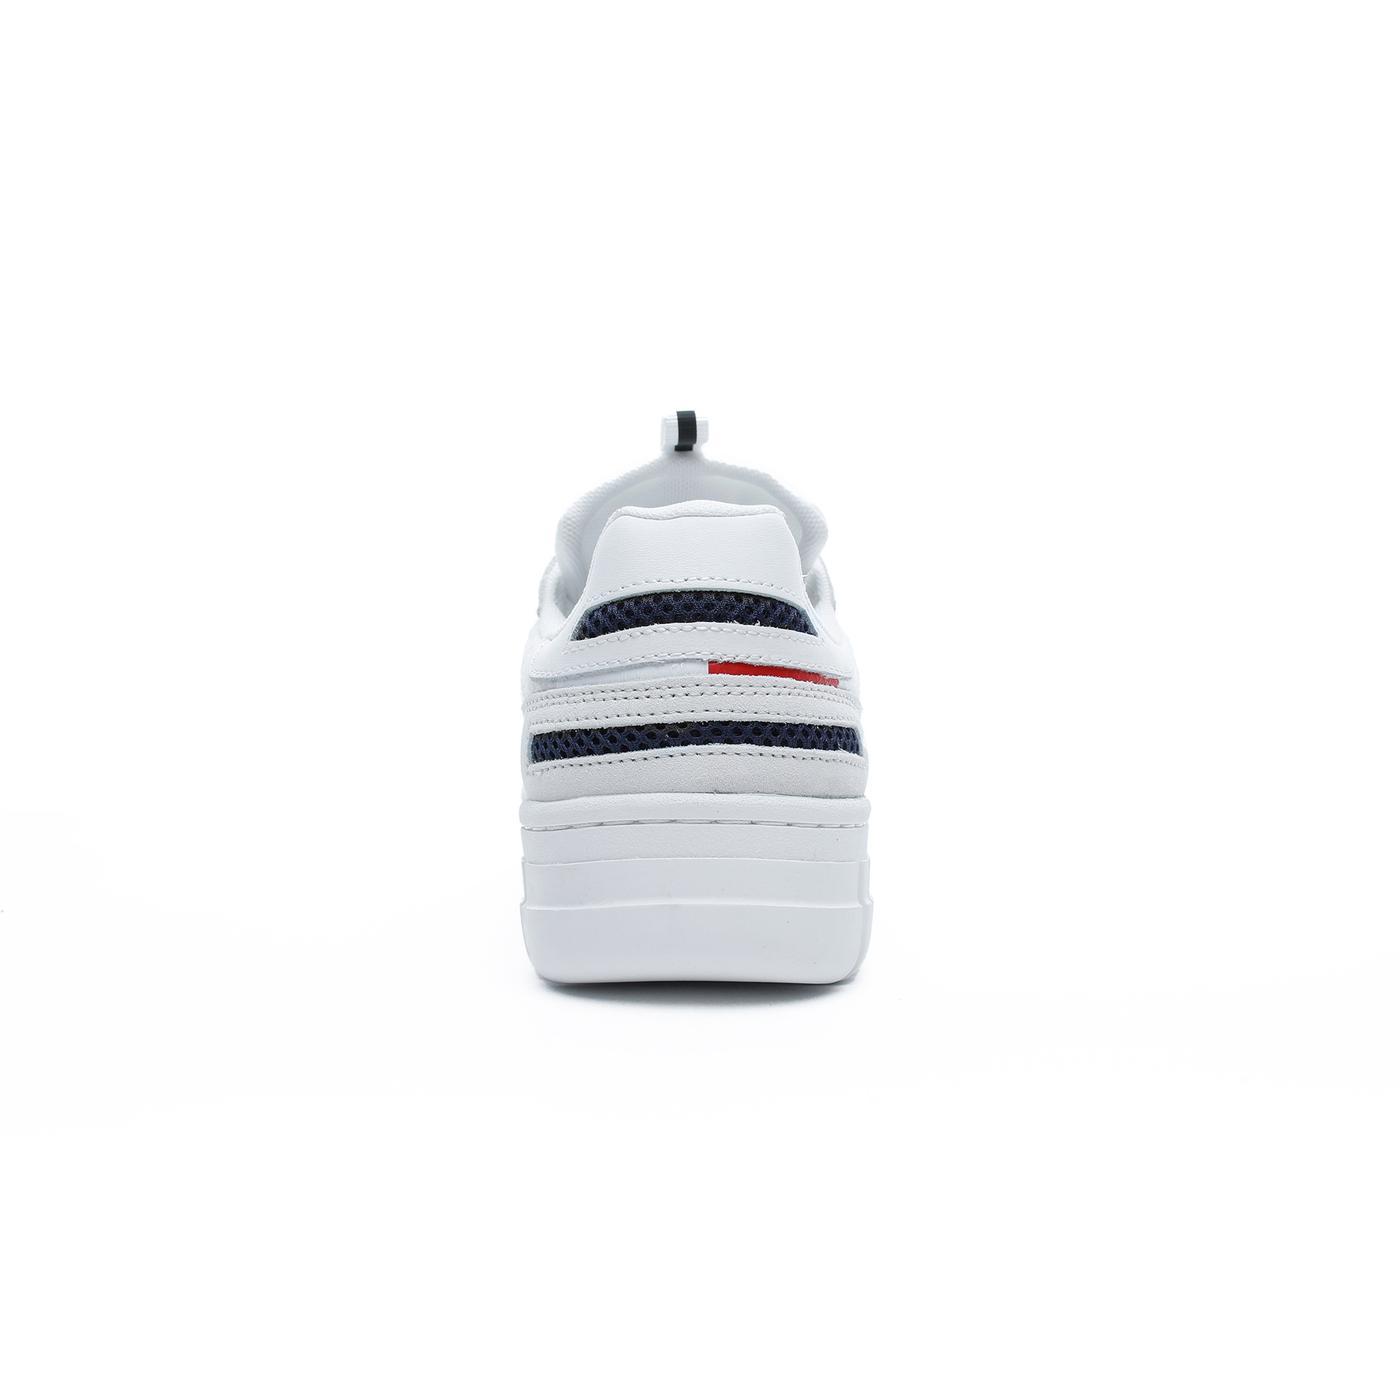 Tommy Hilfiger Retro Mesh Erkek Beyaz Spor Ayakkabı